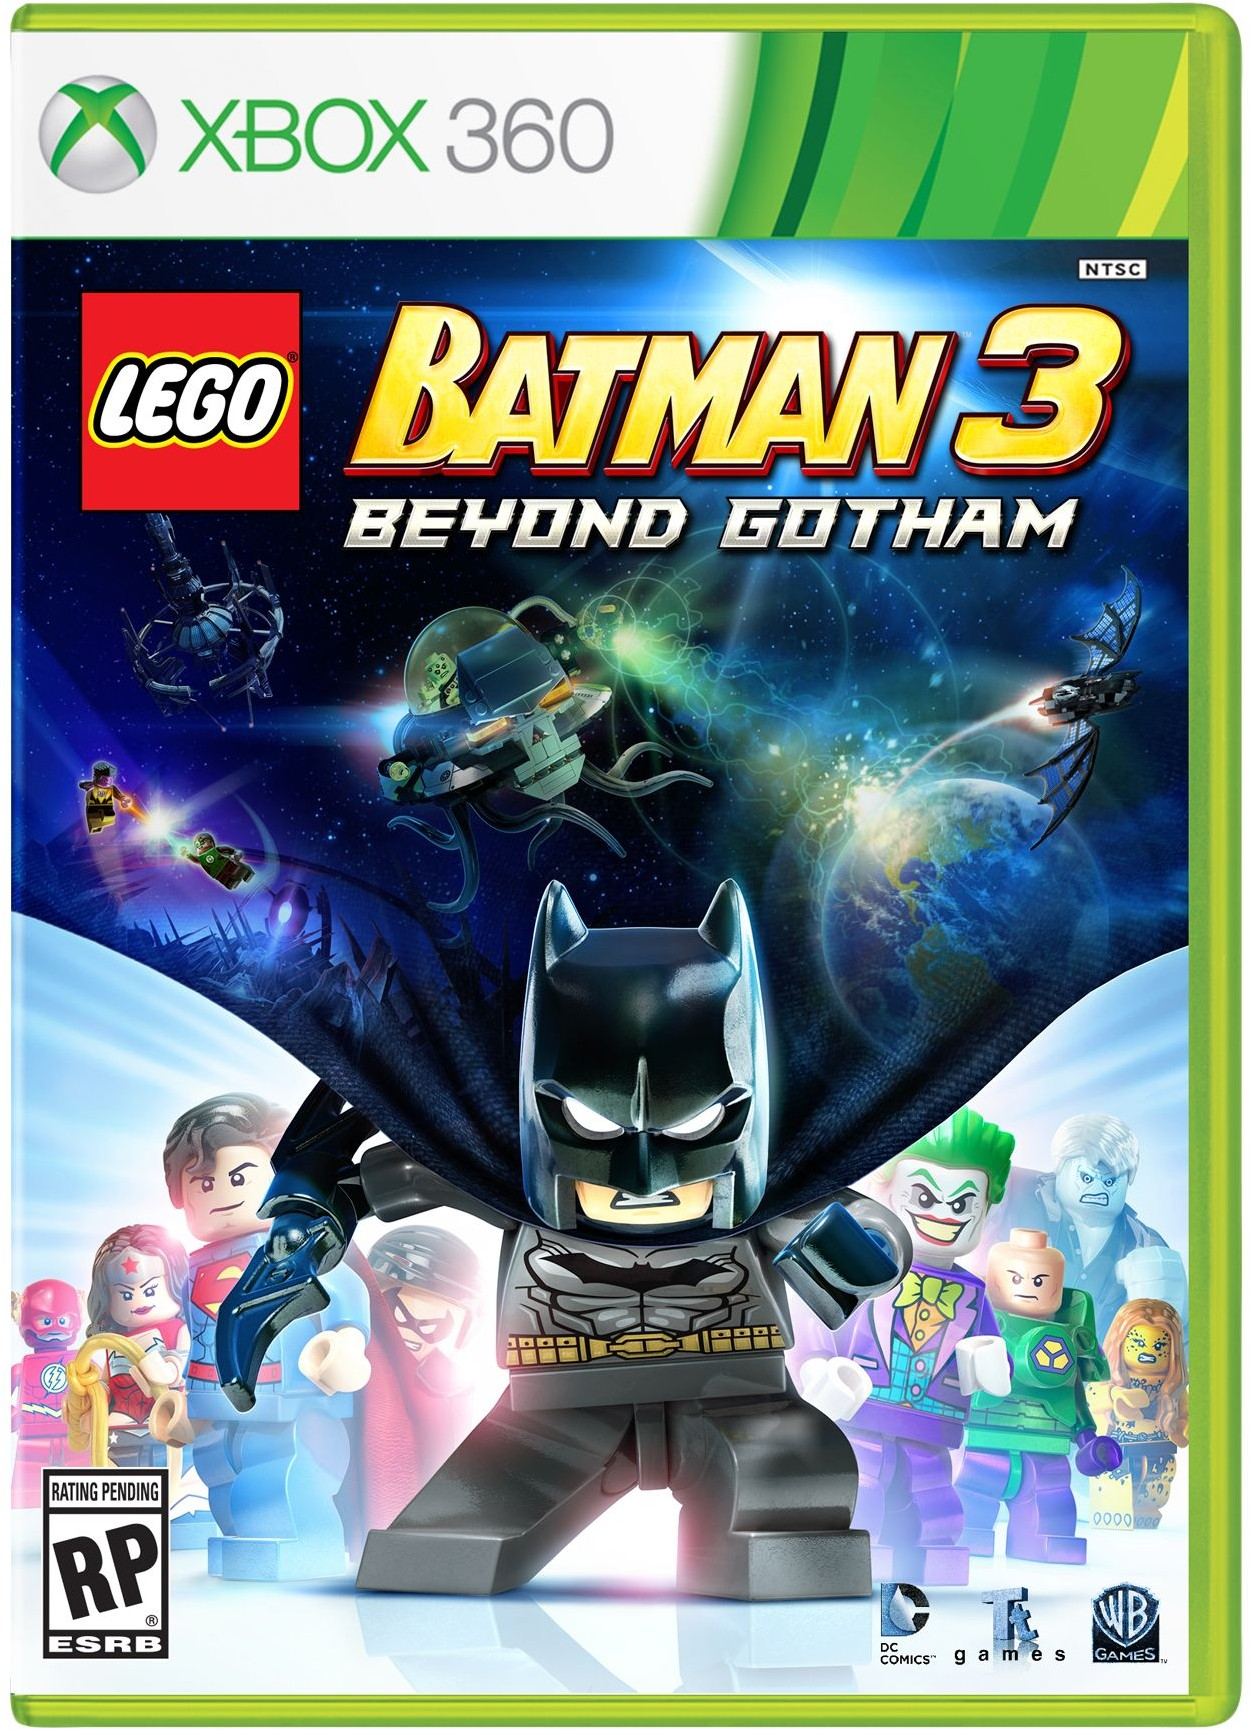 LEGO Video Games for adults lego batman 3